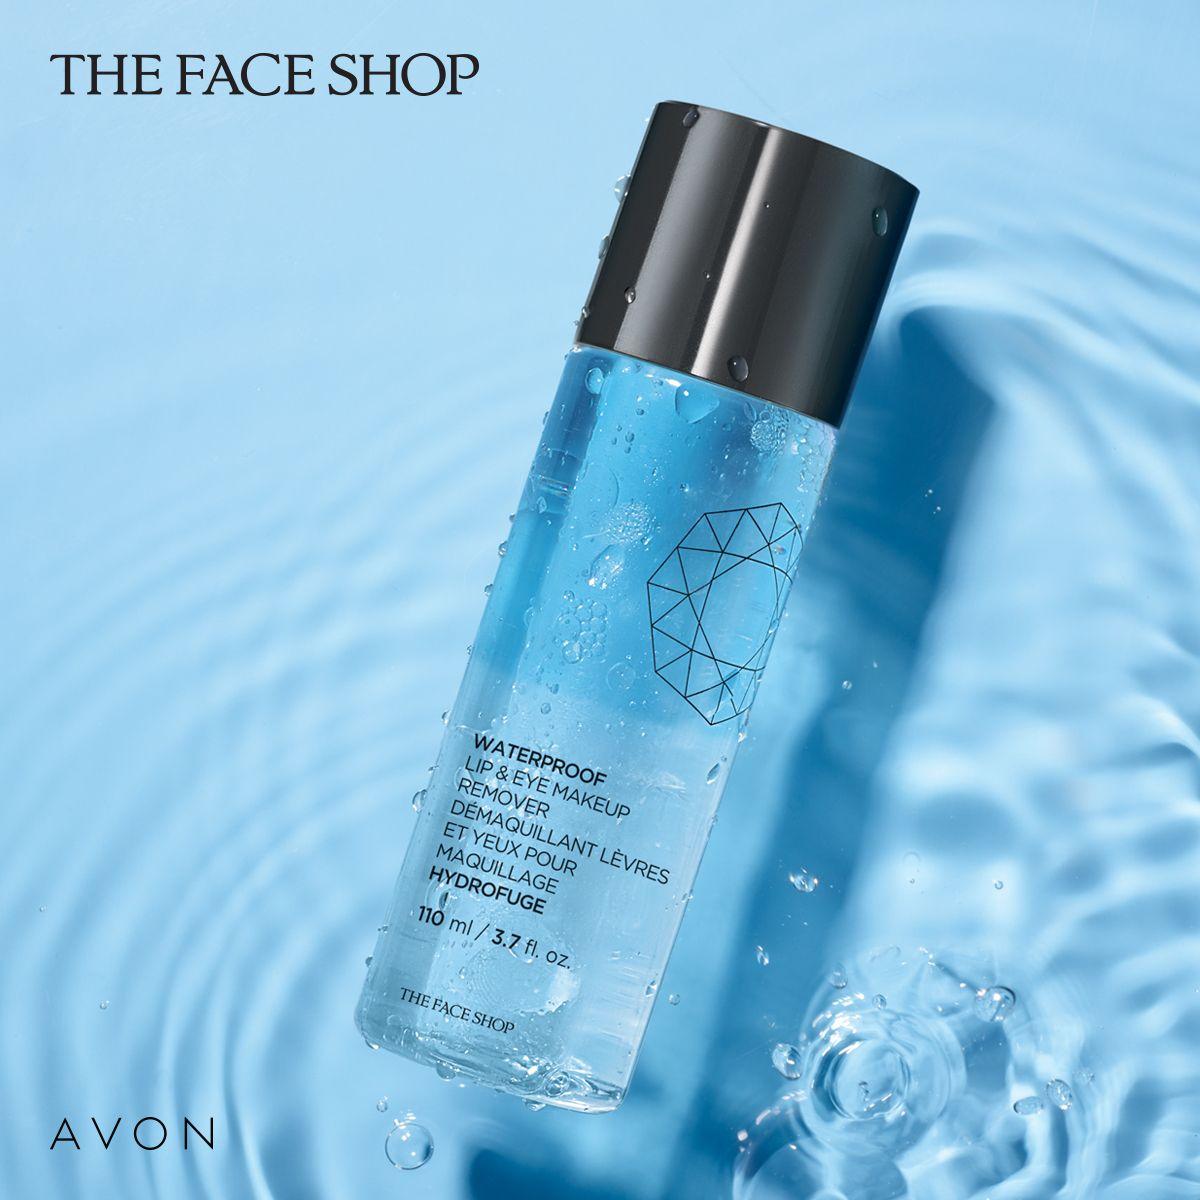 Waterproof Lip & Eye Makeup Remover